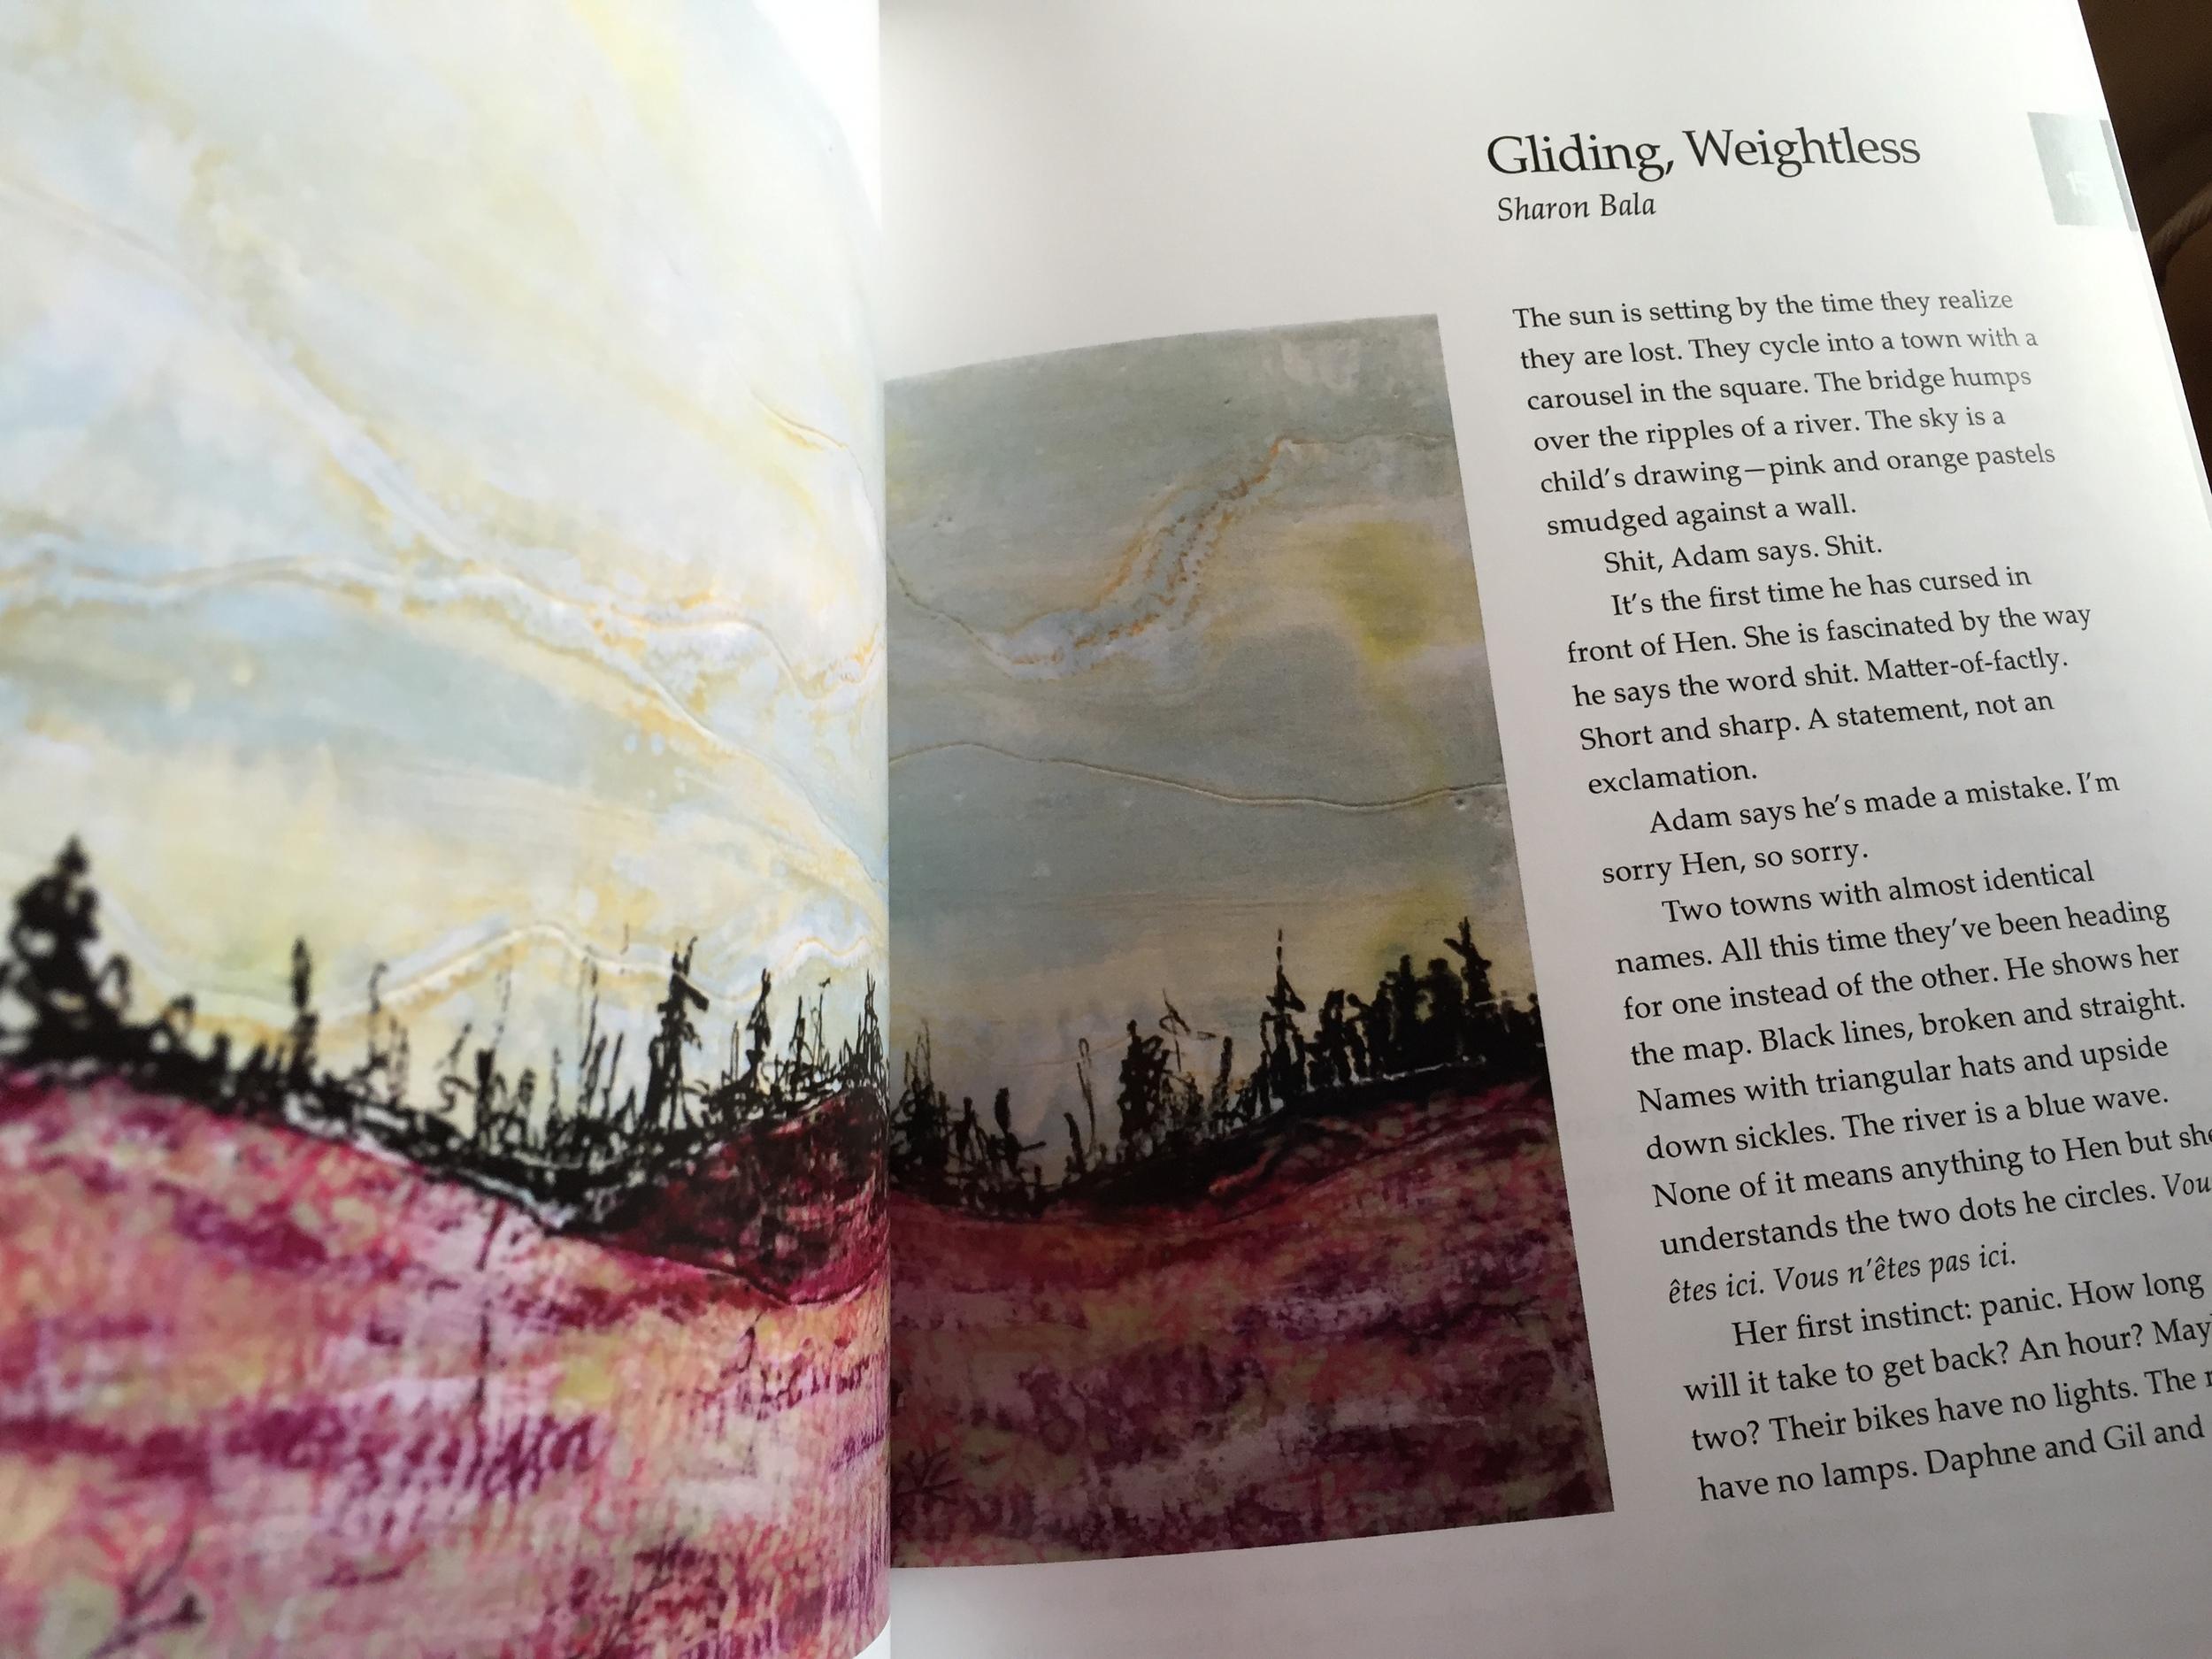 Gliding, Weightless by Sharon Bala